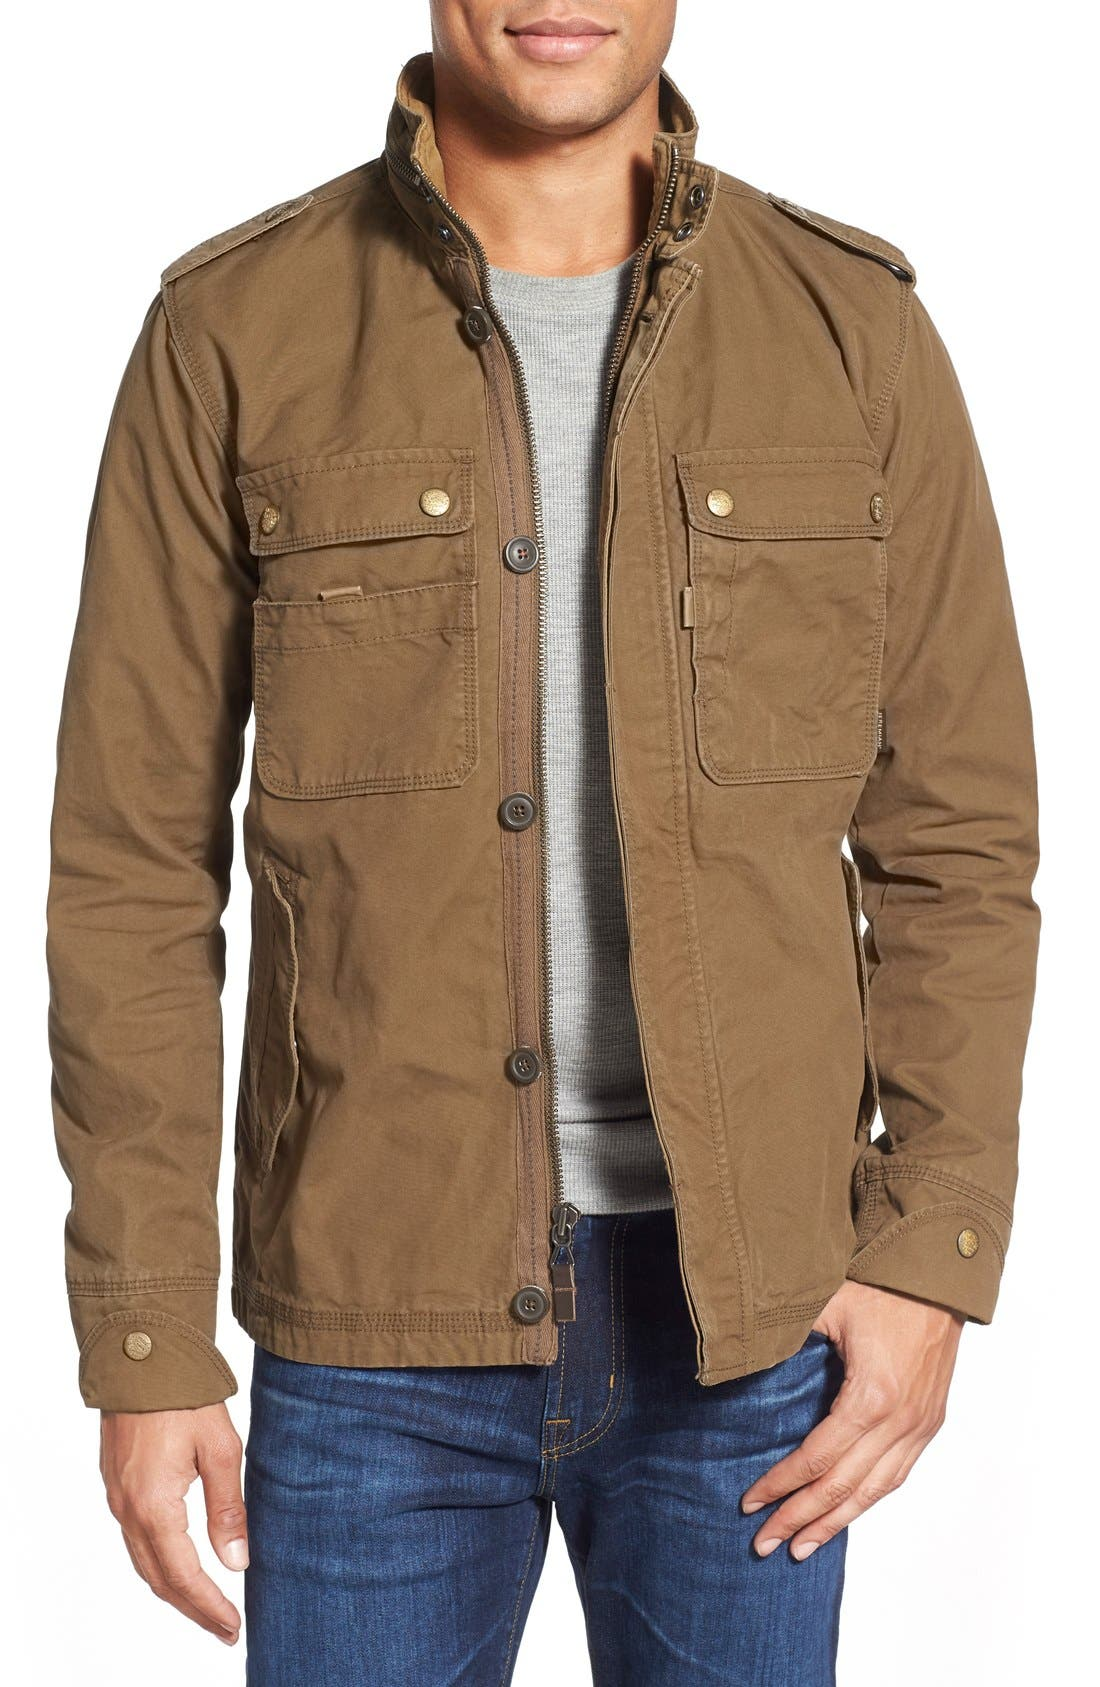 Main Image - Jeremiah 'Paxton' Military Jacket with Stowaway Hood